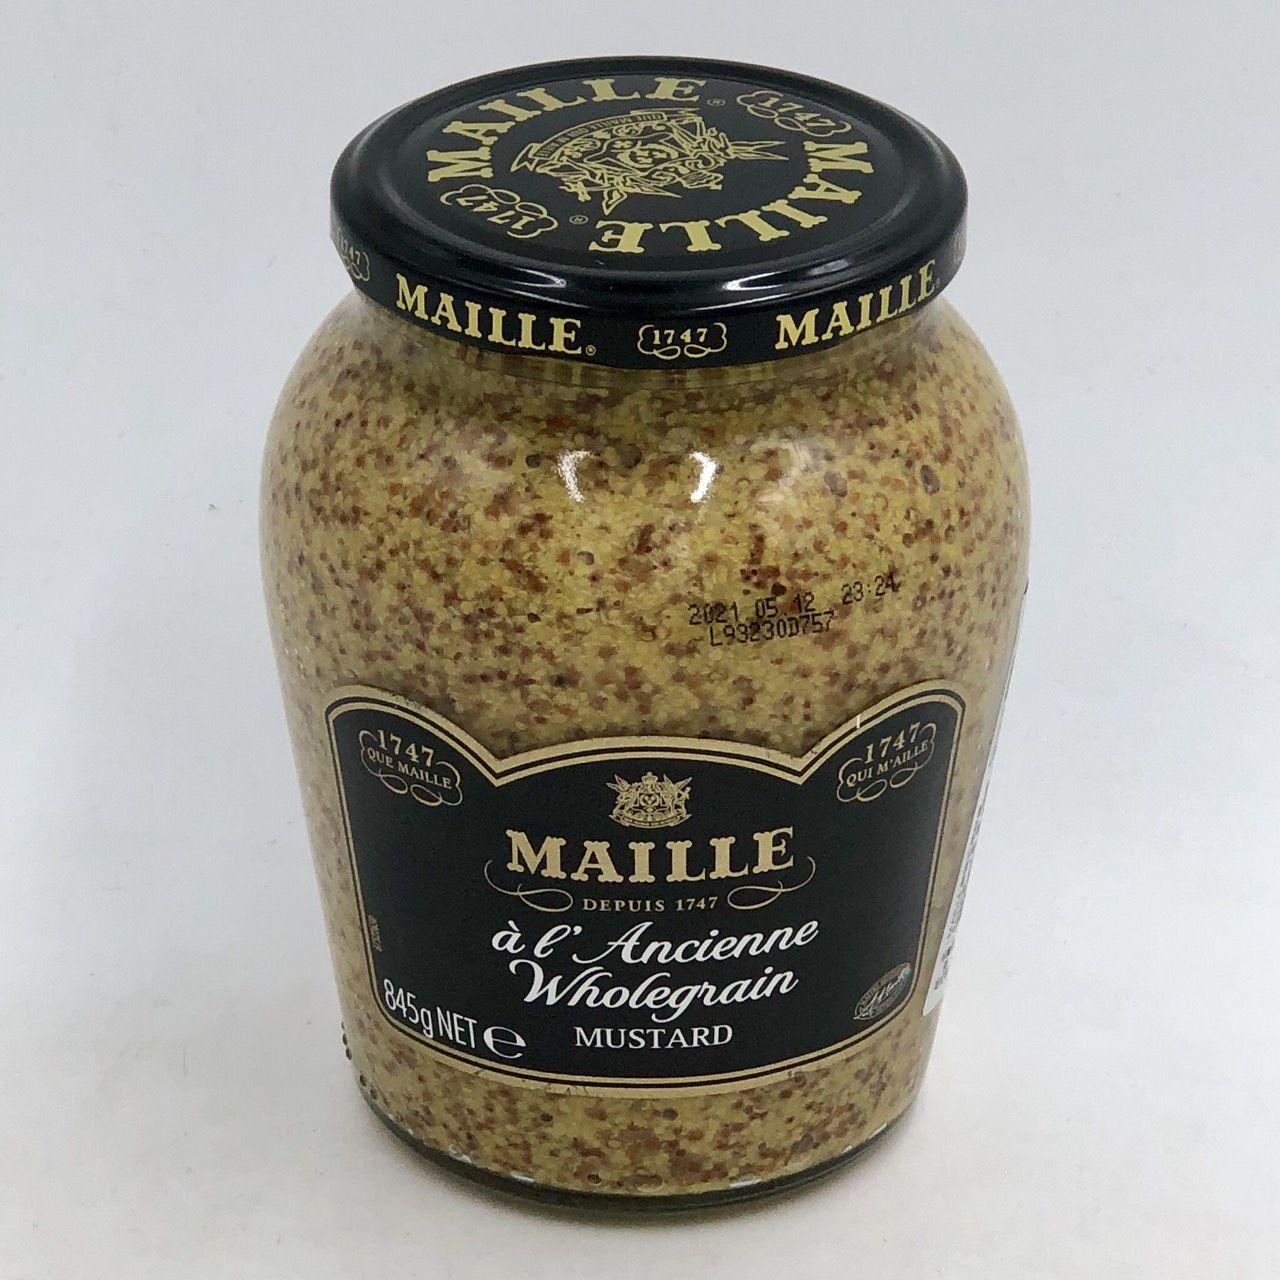 (MAILLE)魅雅芥末籽醬845g(全素)